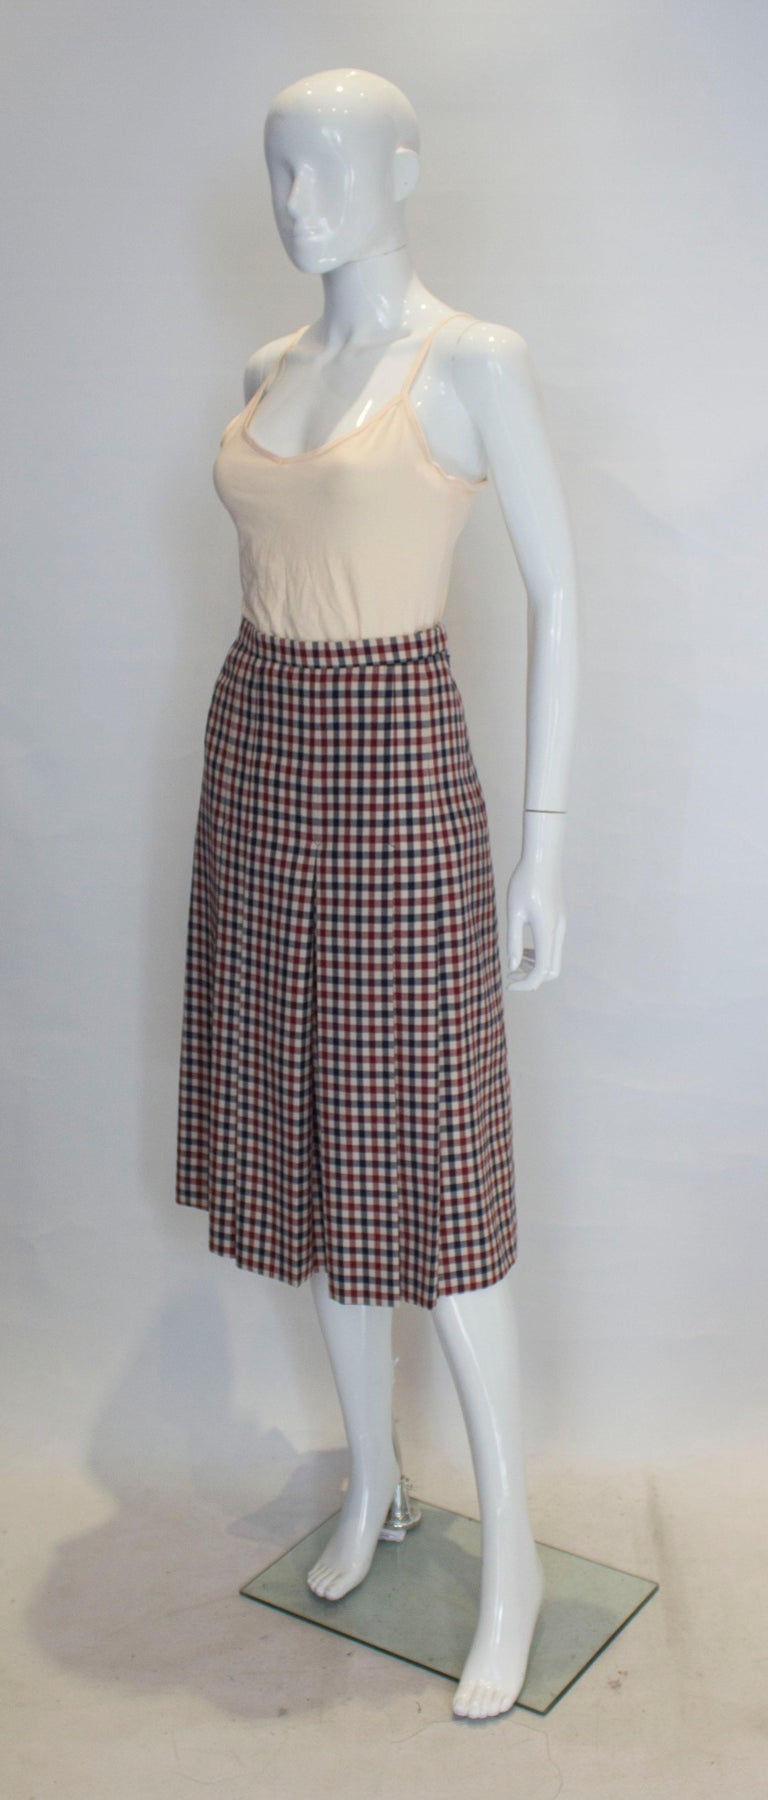 Gray Vintage Acquascutum Check Skirt For Sale